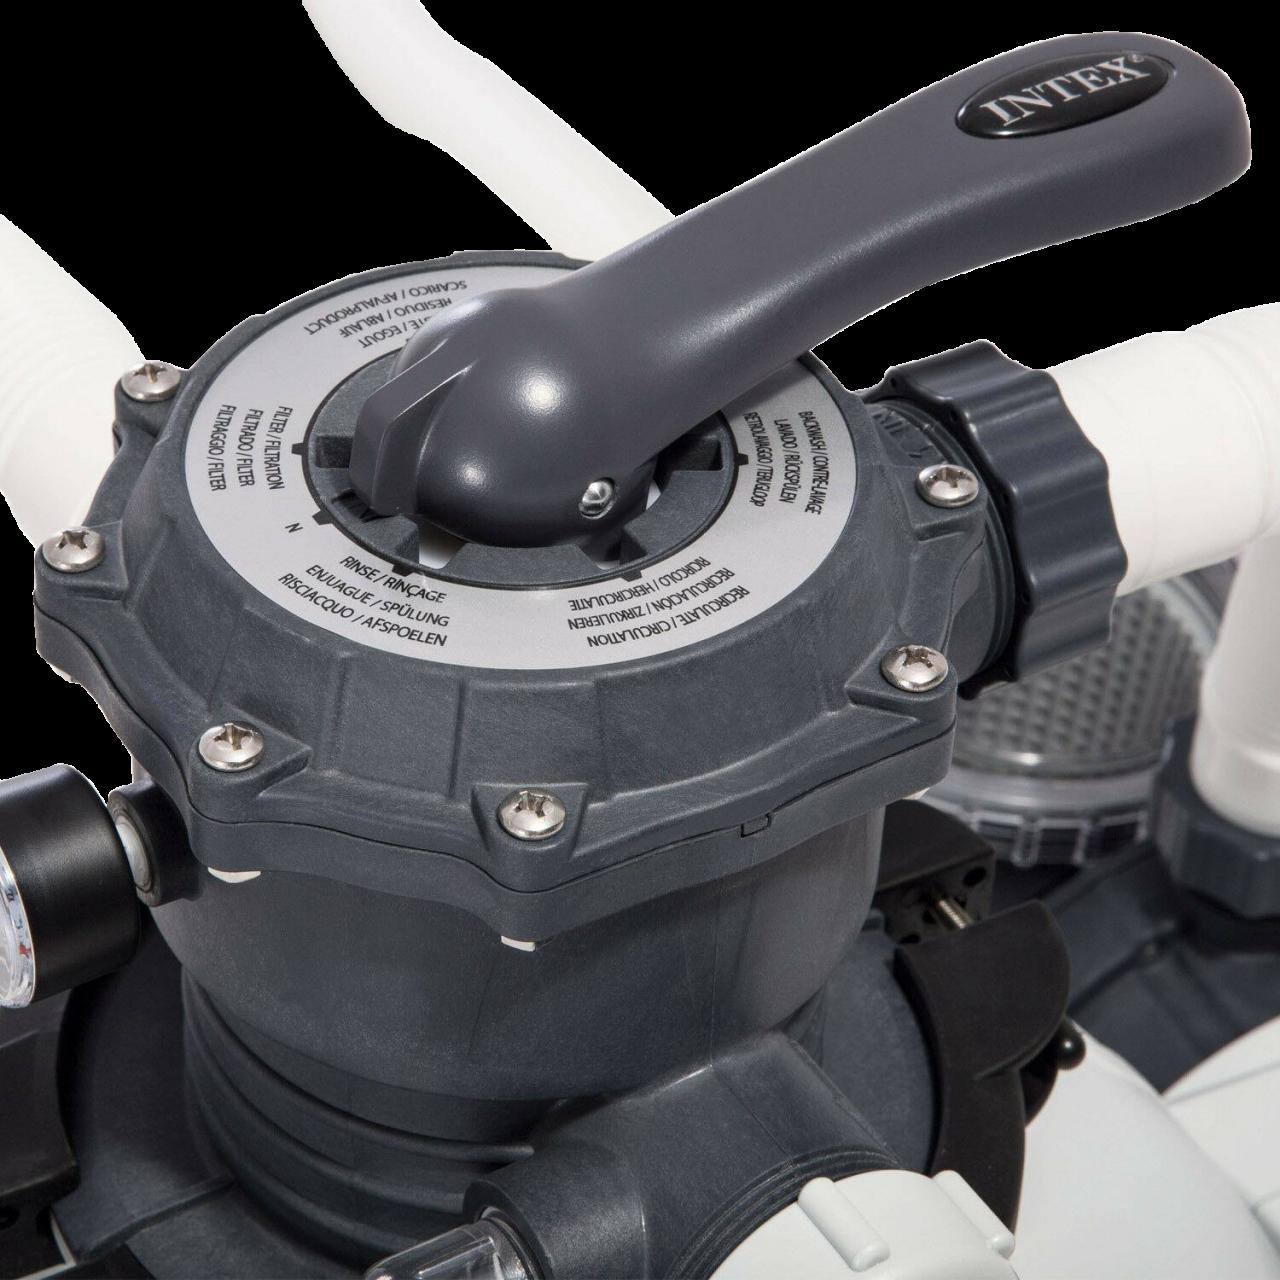 Intex 26652 Sandfilteranlage 12.000 l/h Pool Pumpe Filterpumpe Krystal Clear